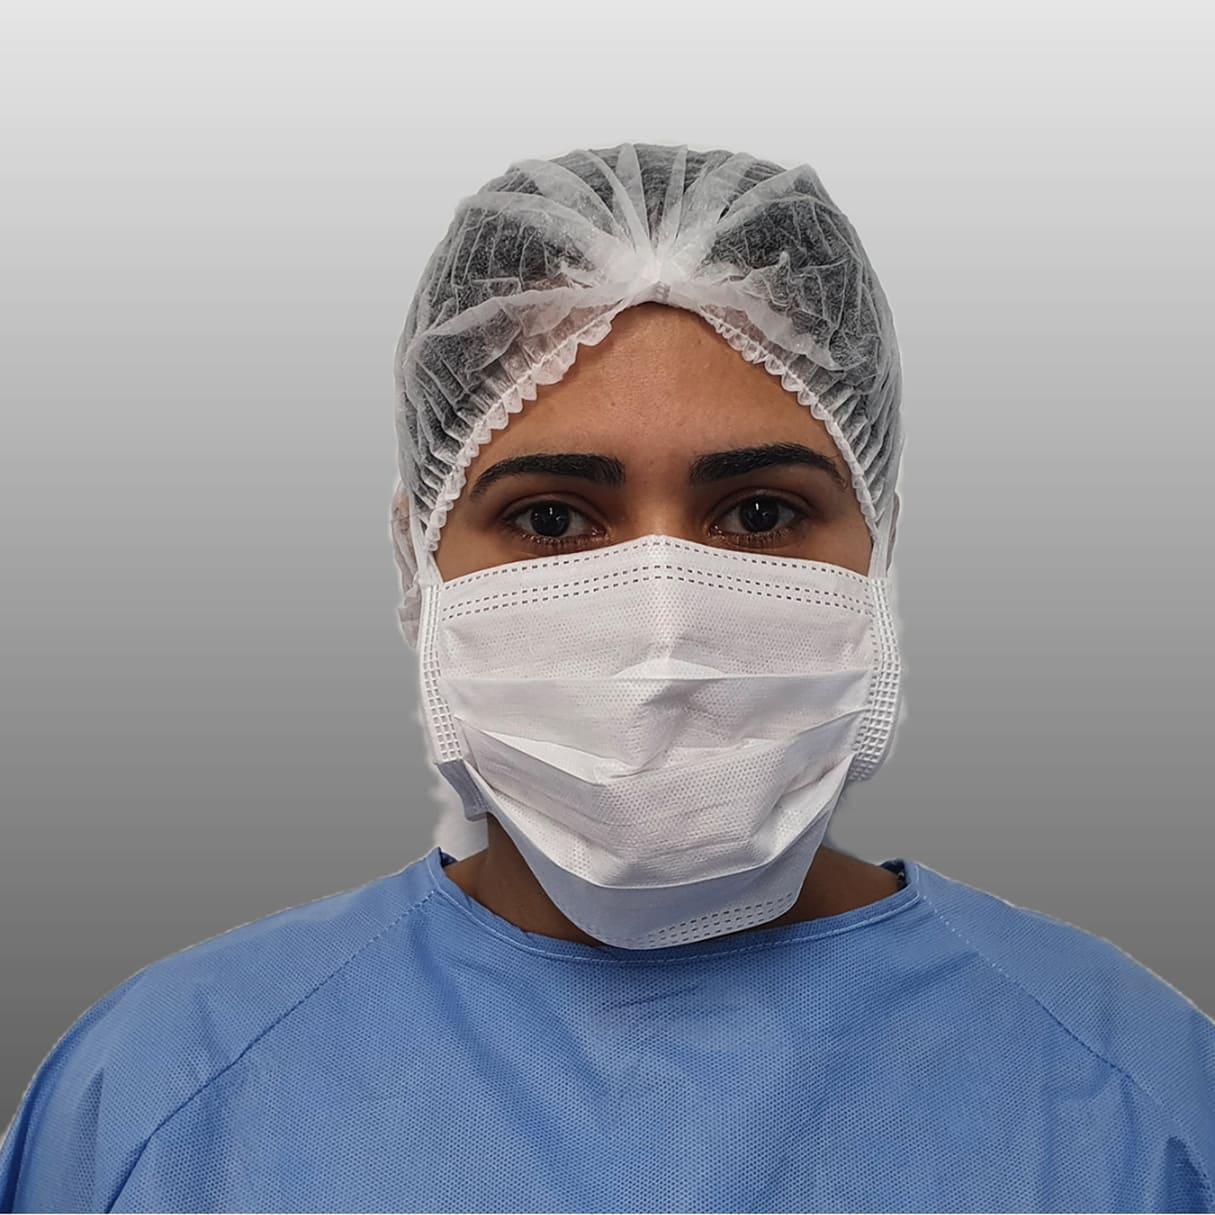 Fábrica de máscara cirúrgica descartável